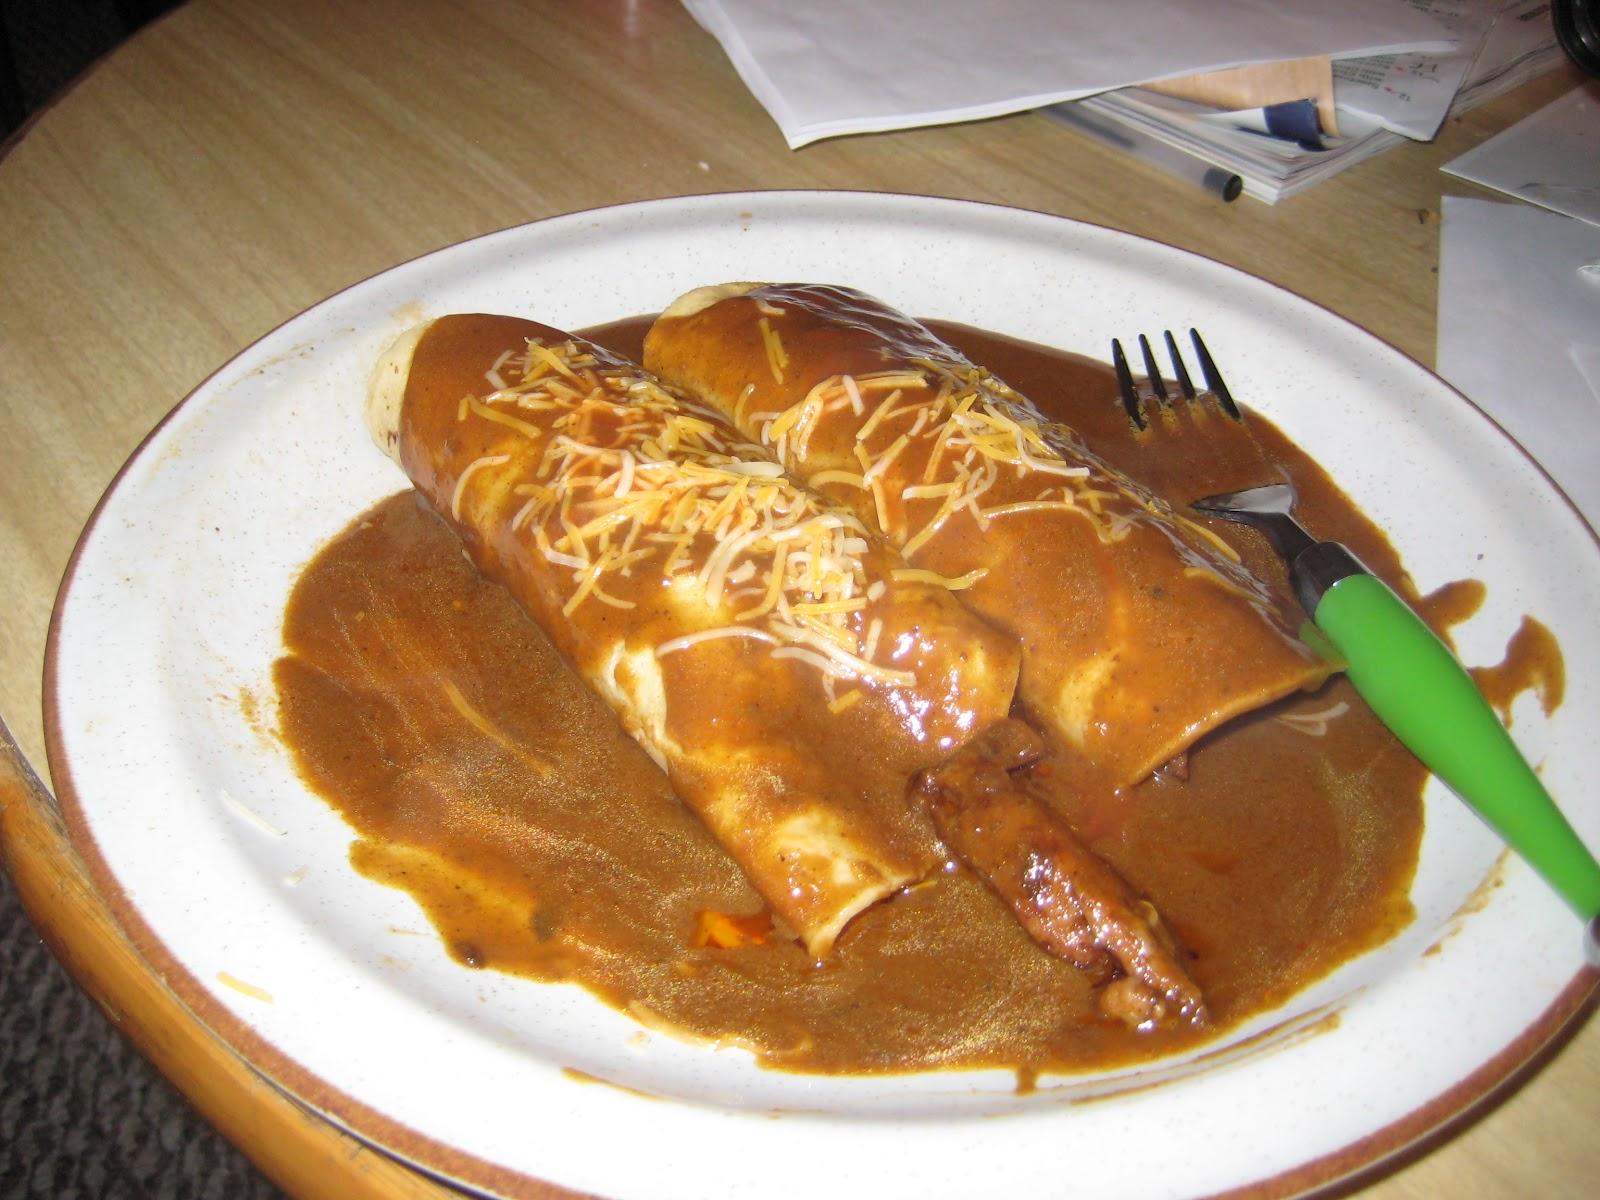 enchiladas enmoladas or mole enchiladas chicken enmoladas mole chicken ...